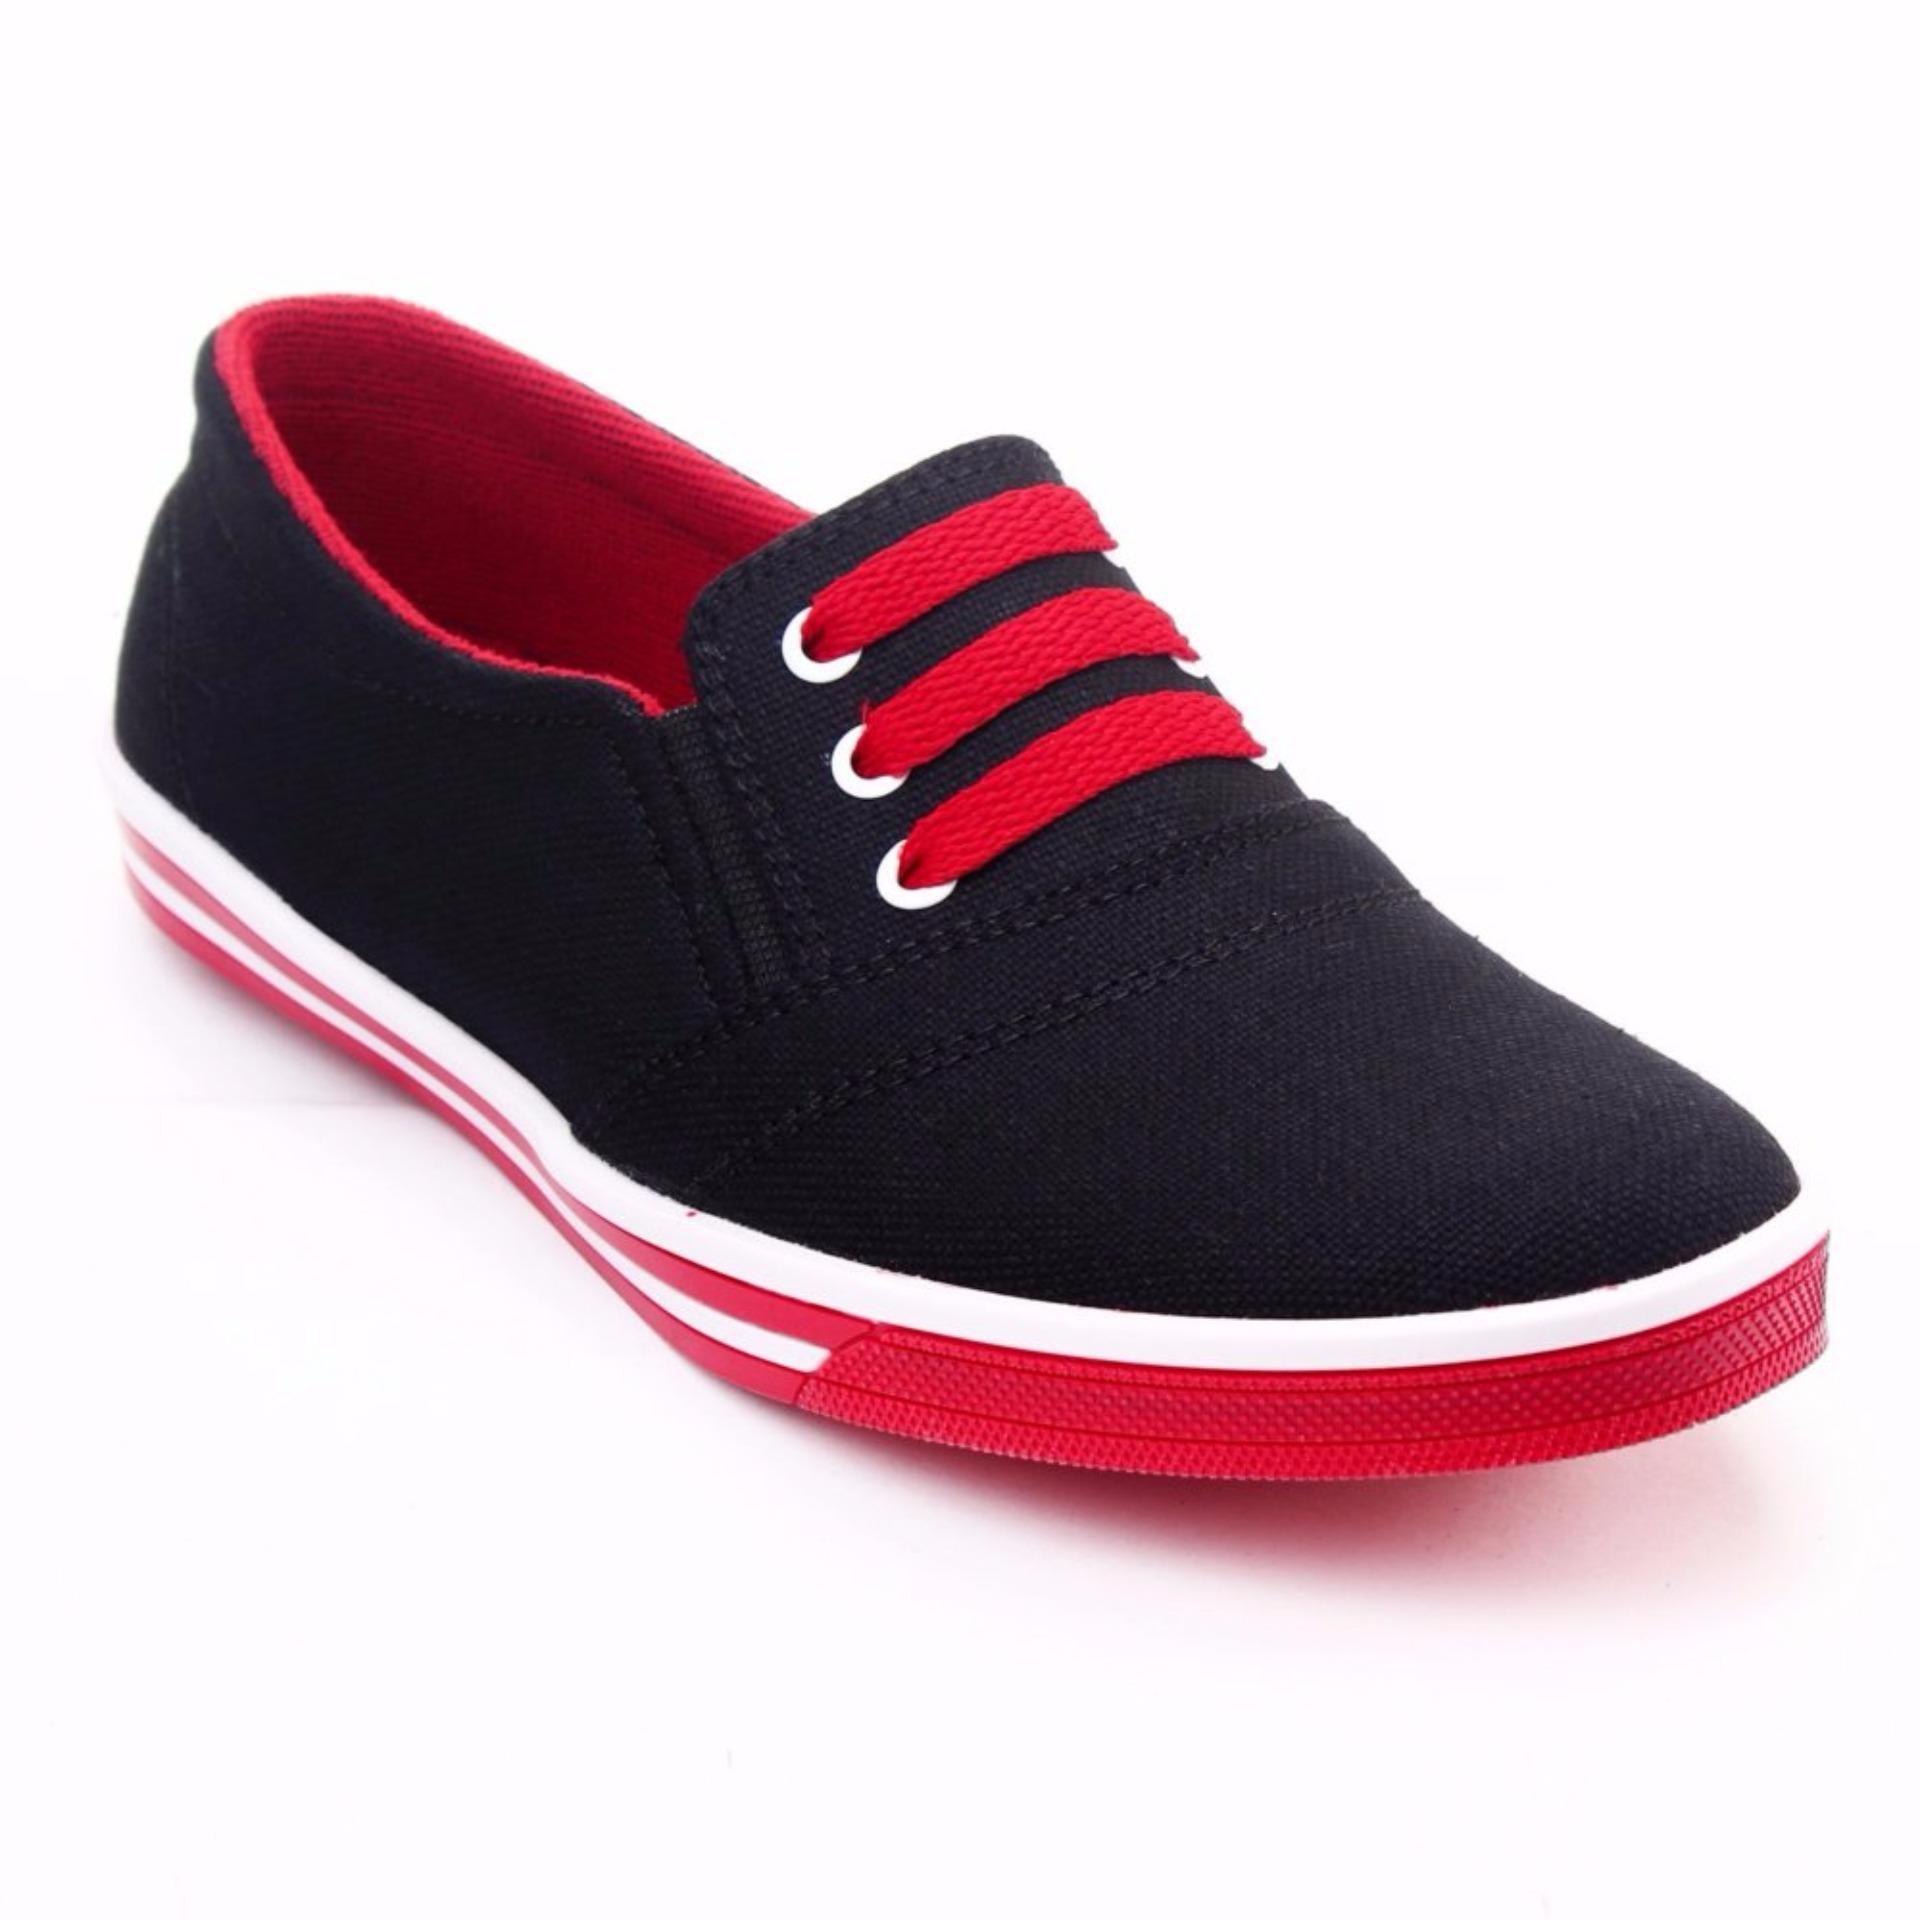 ... Yutaka Sepatu Kets Sneakers Hitam-Merah ...